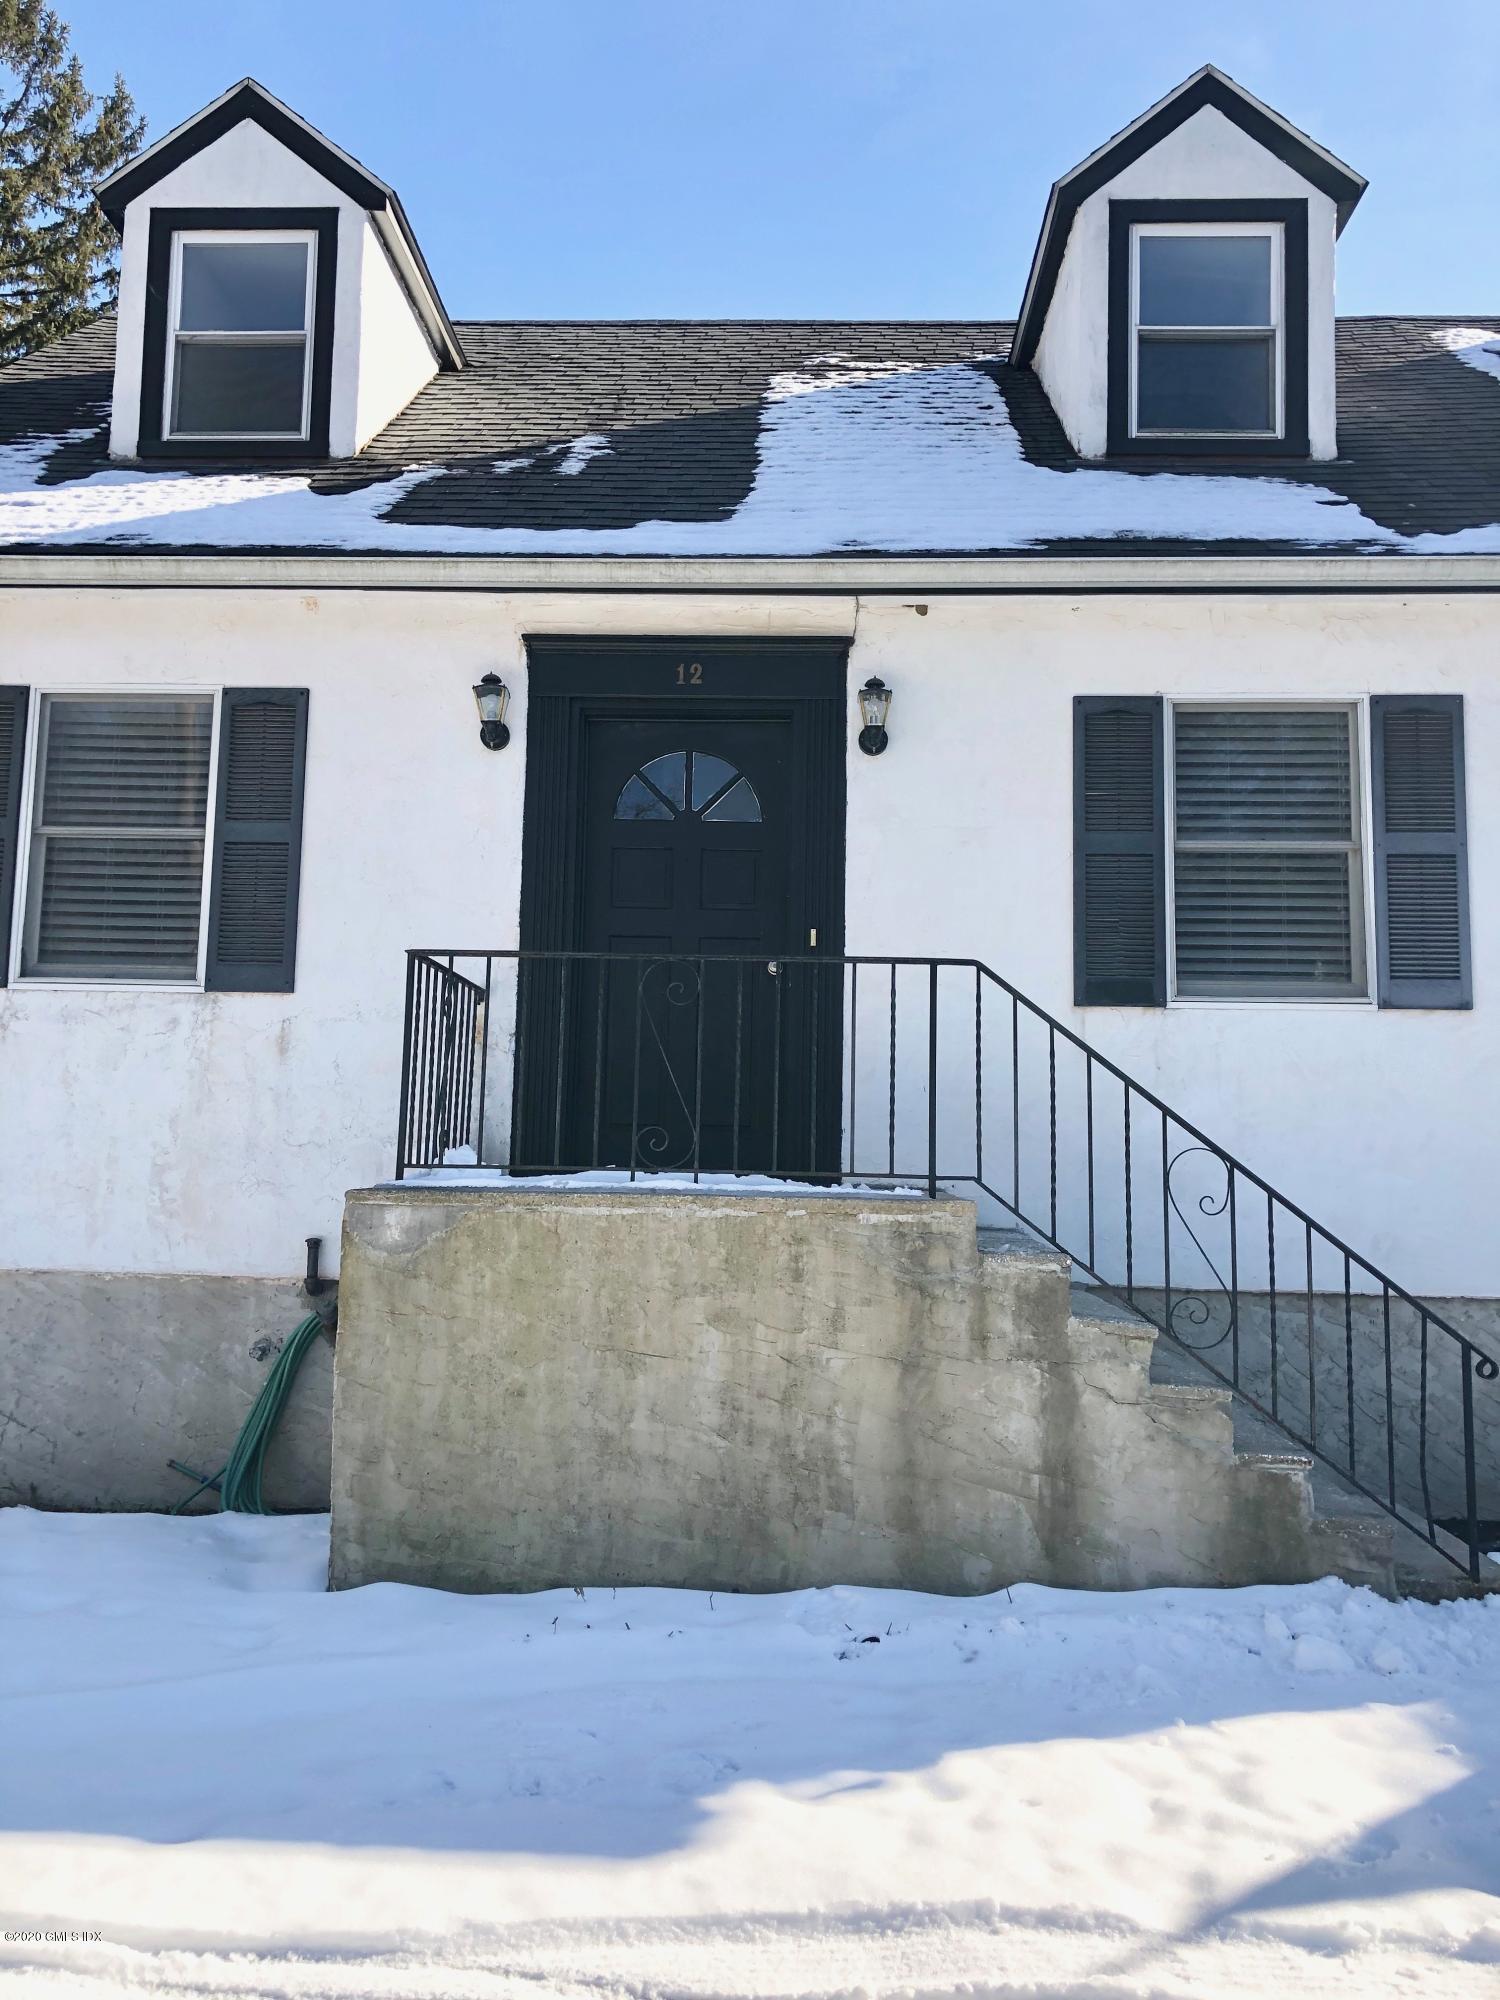 12 Concord Street,Greenwich,Connecticut 06831,1 Bedroom Bedrooms,1 BathroomBathrooms,Apartment,Concord,108658